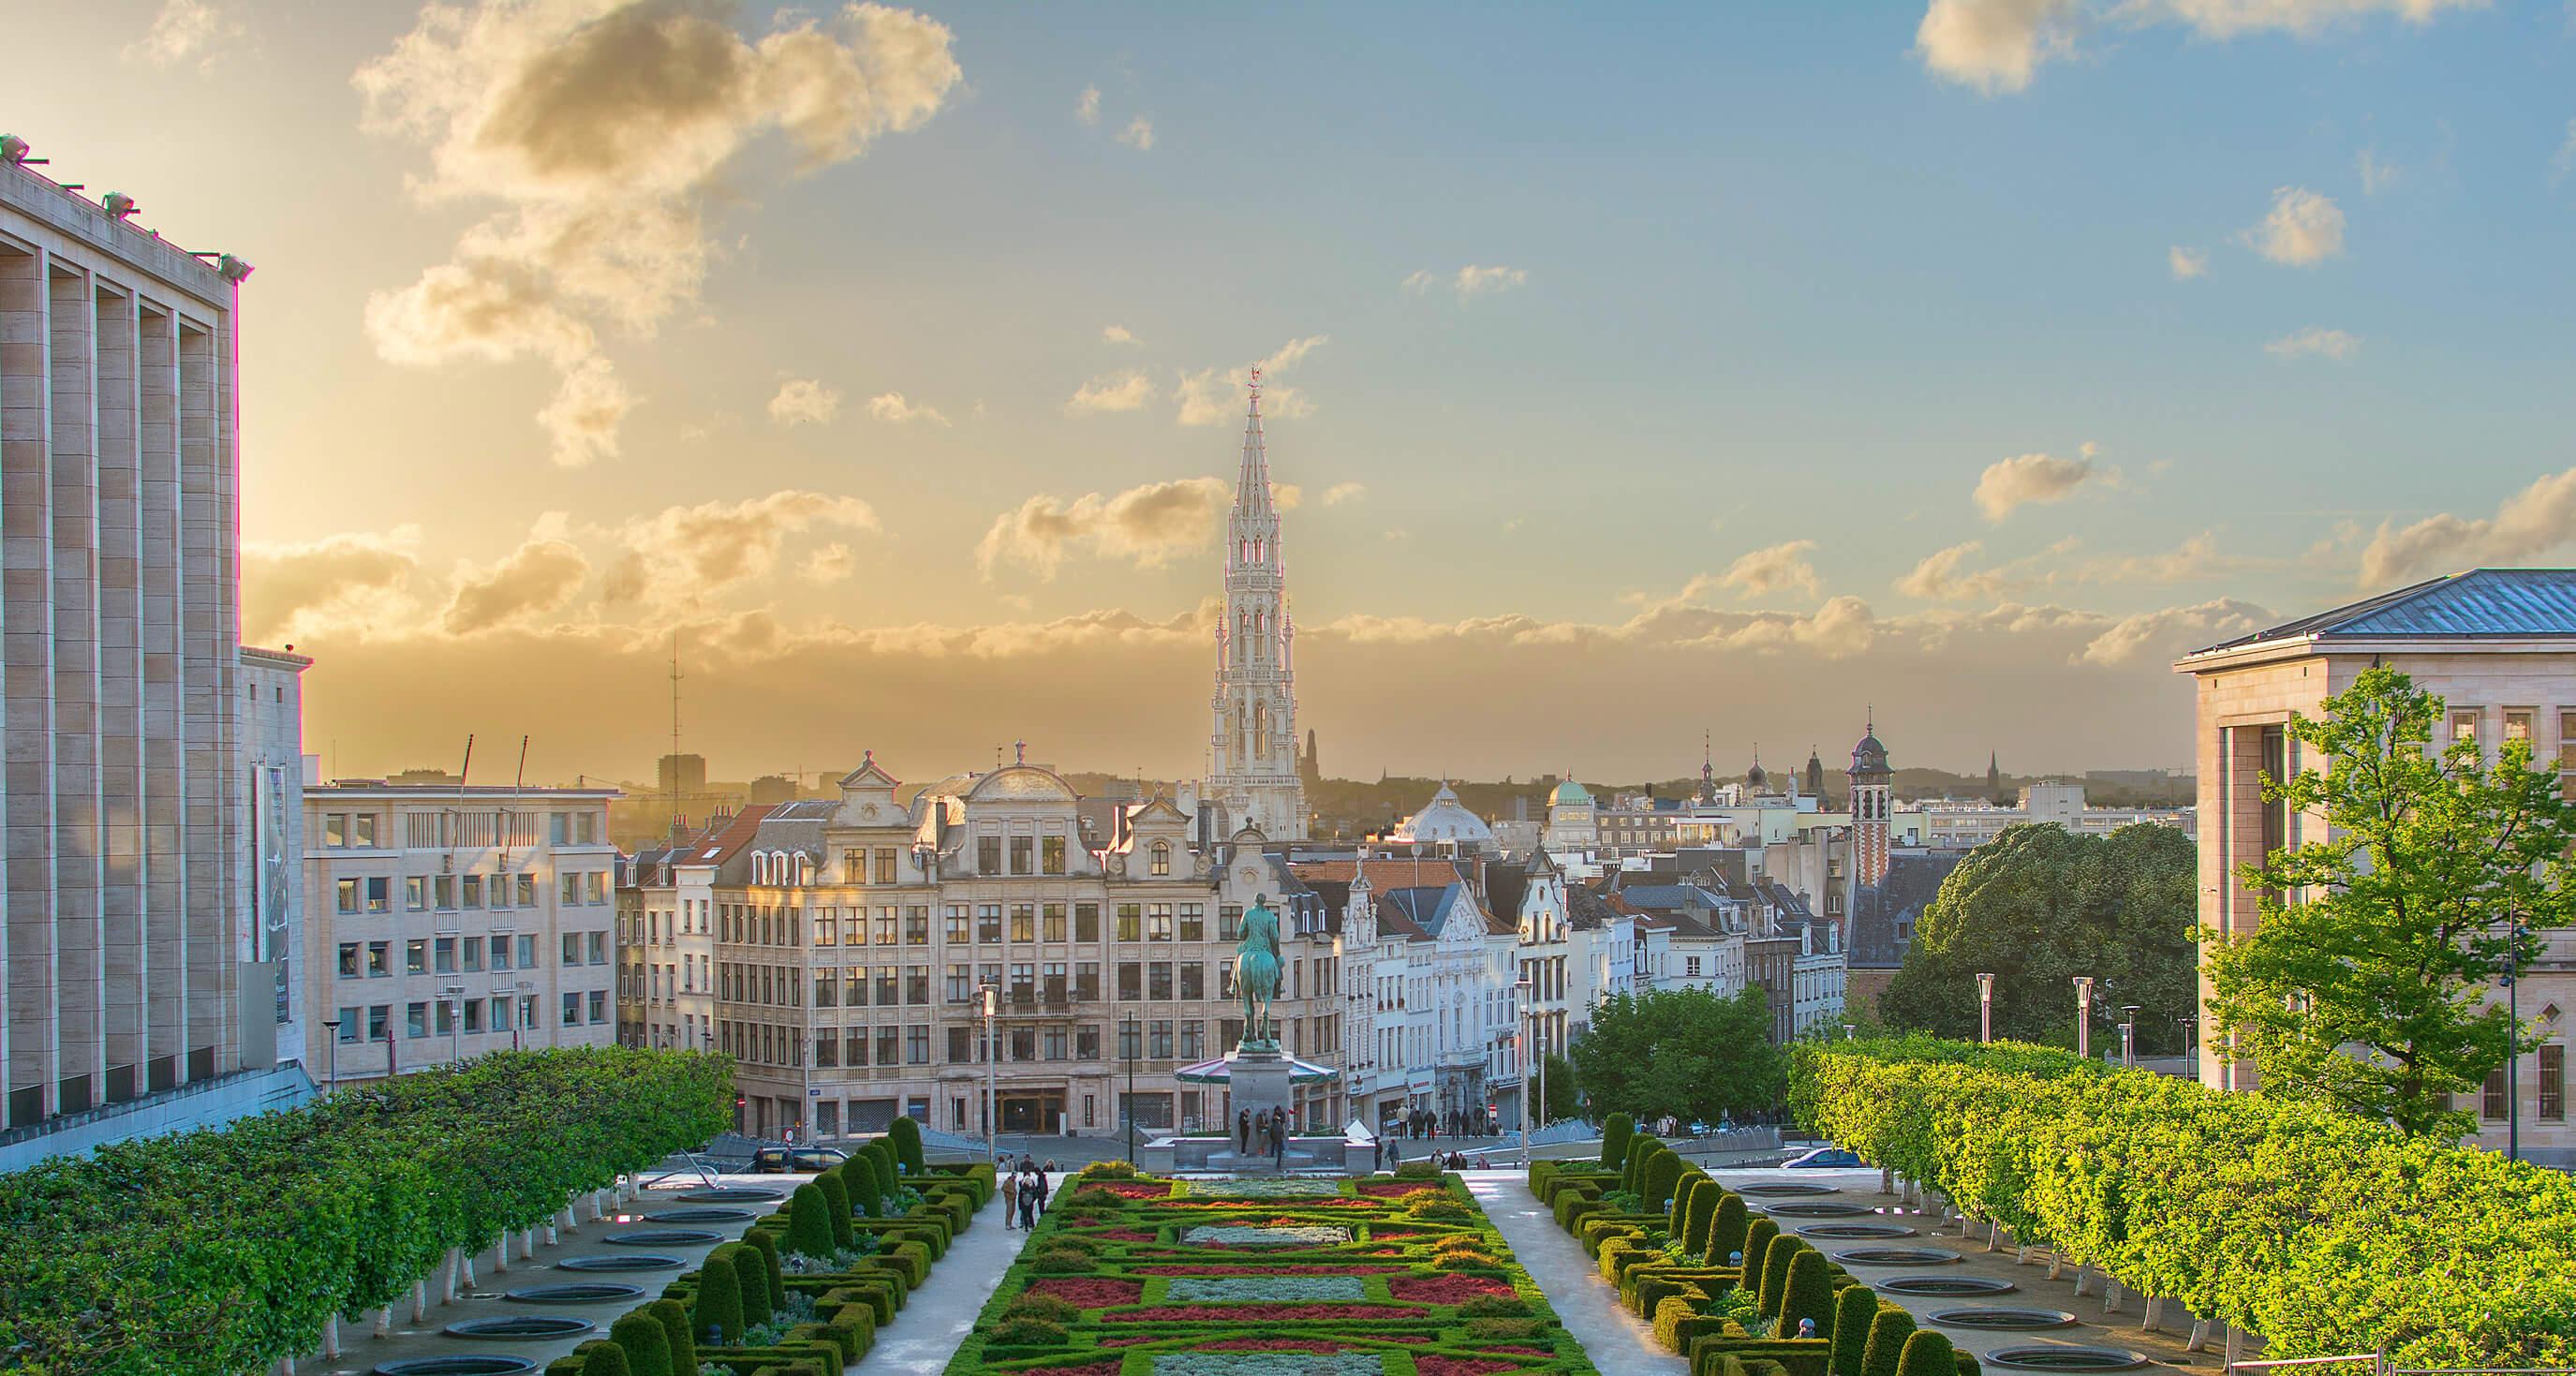 Bruxelles capitali europee